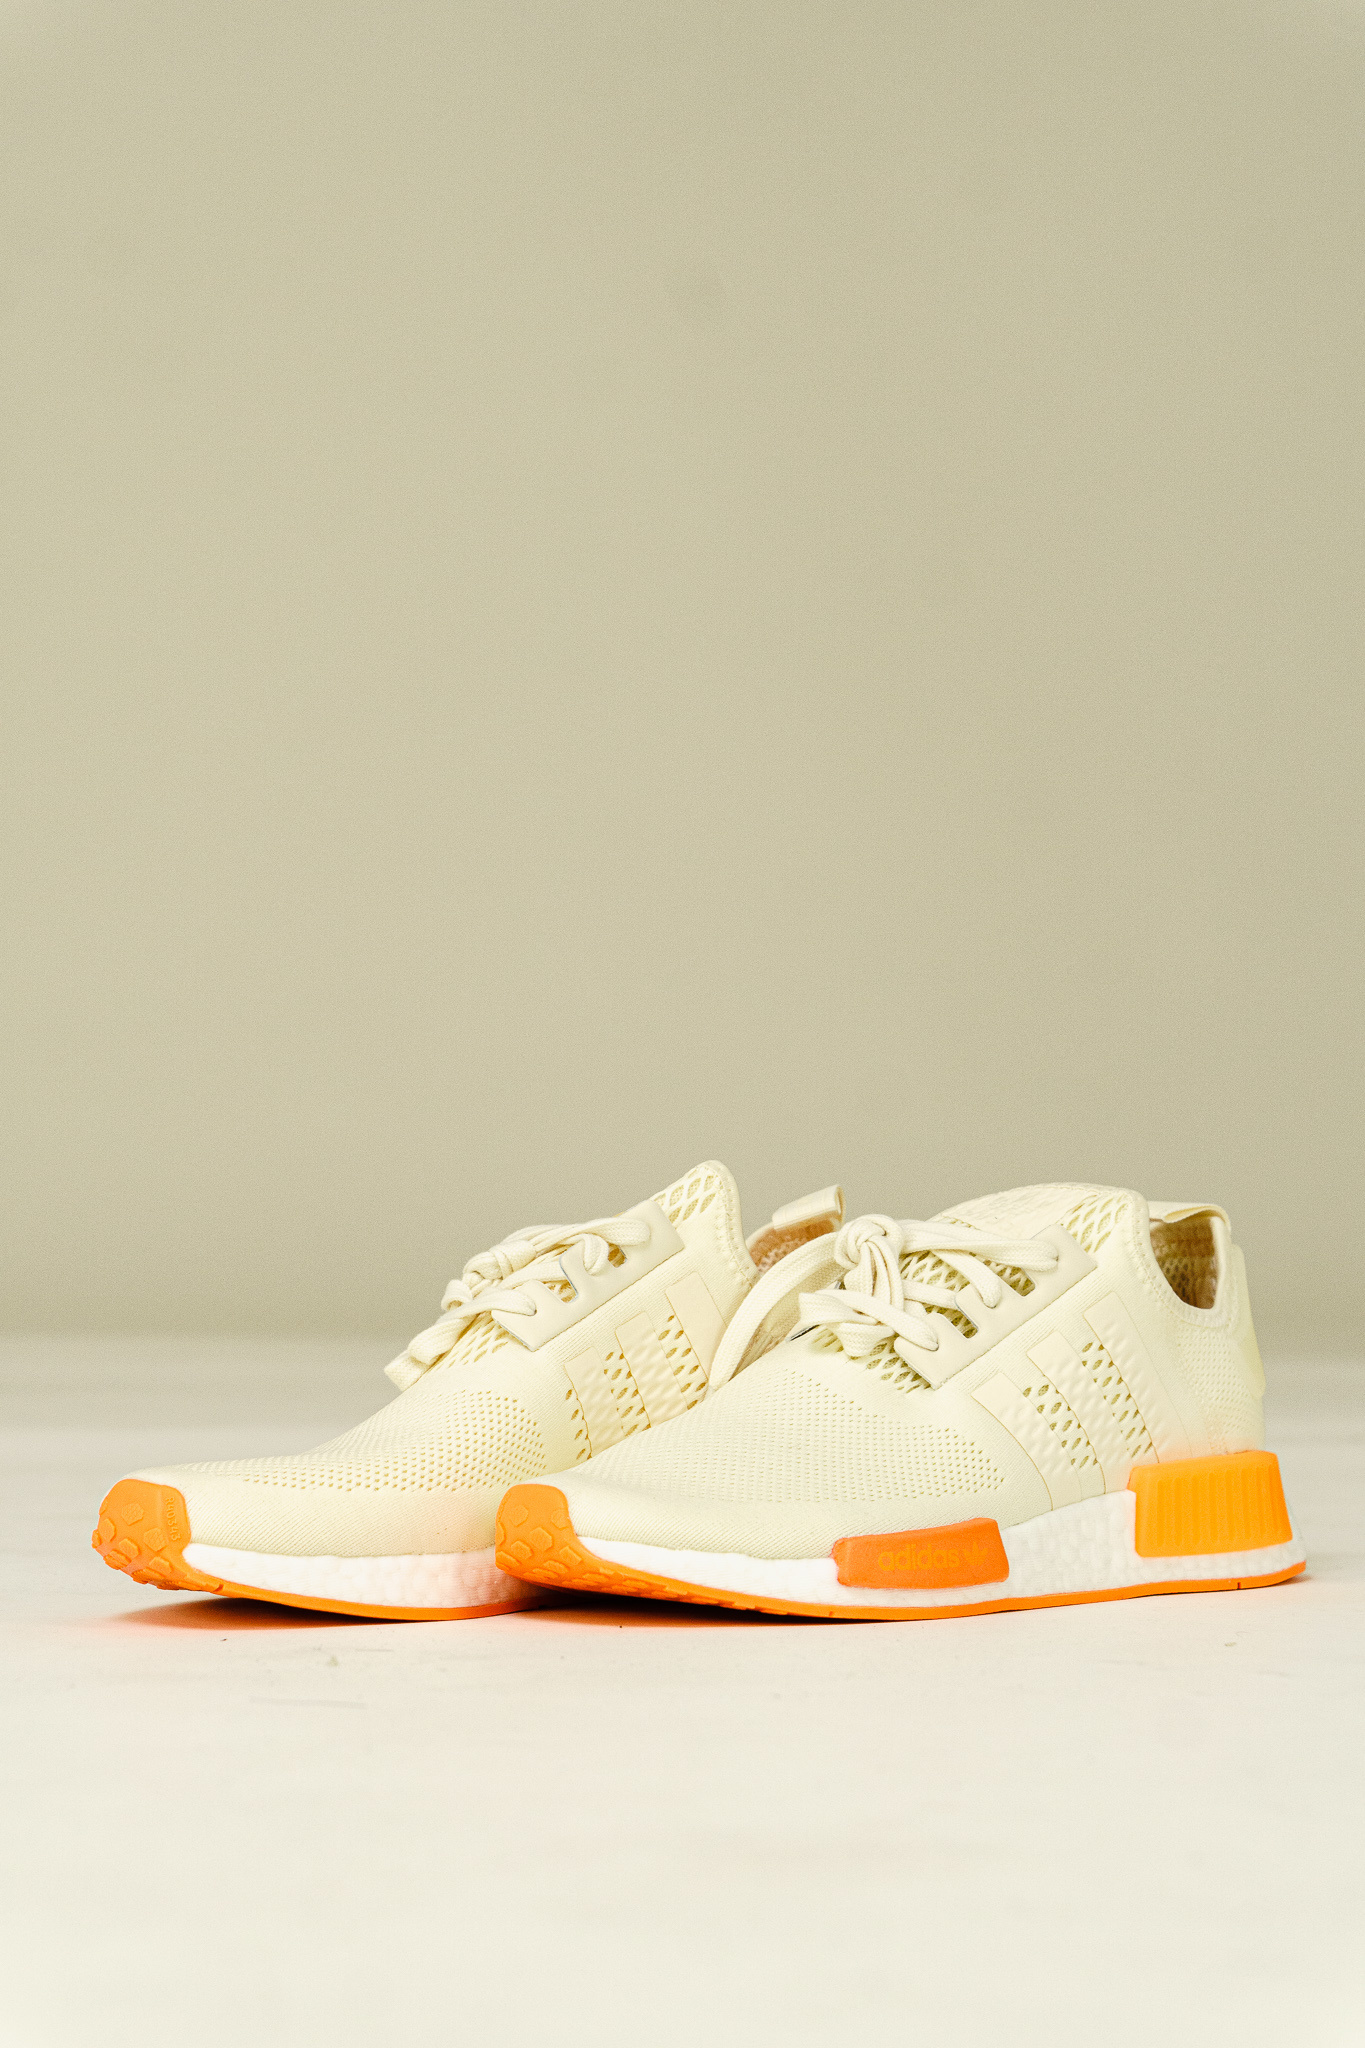 NMD_R1 'Cream White Screaming Orange'